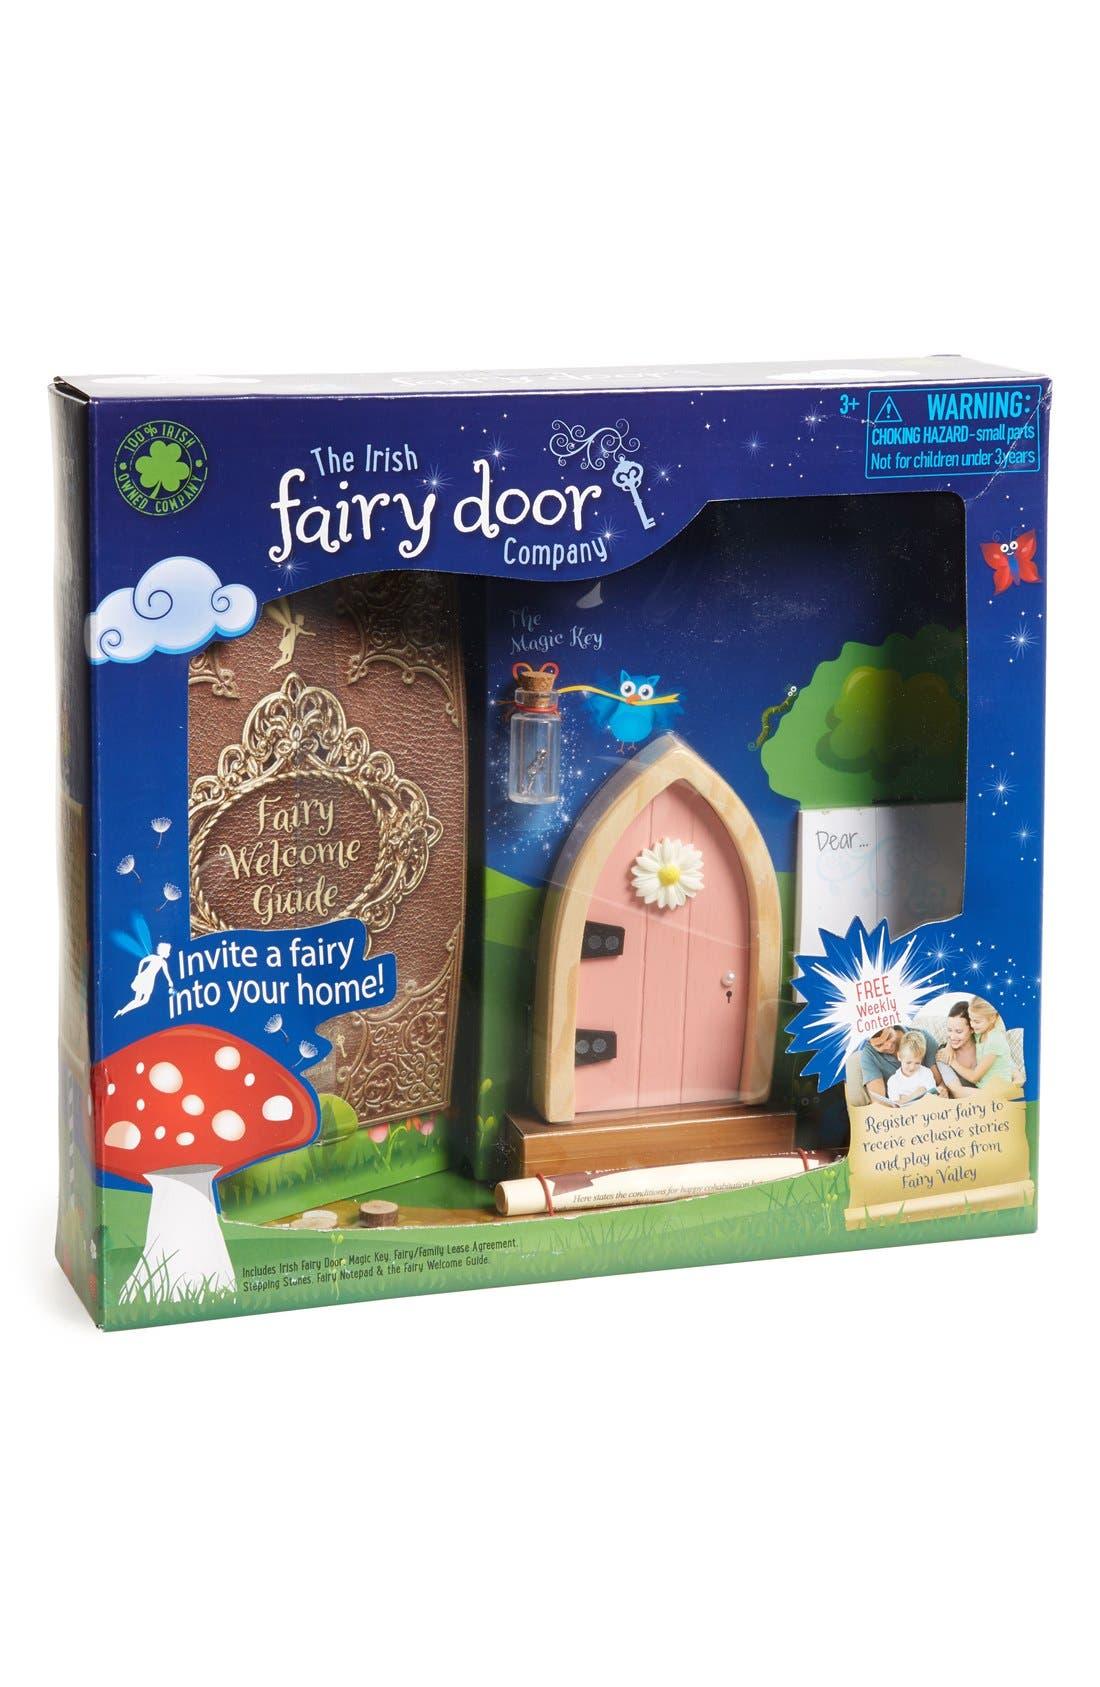 Alternate Image 1 Selected - License 2 Play Irish Fairy Door